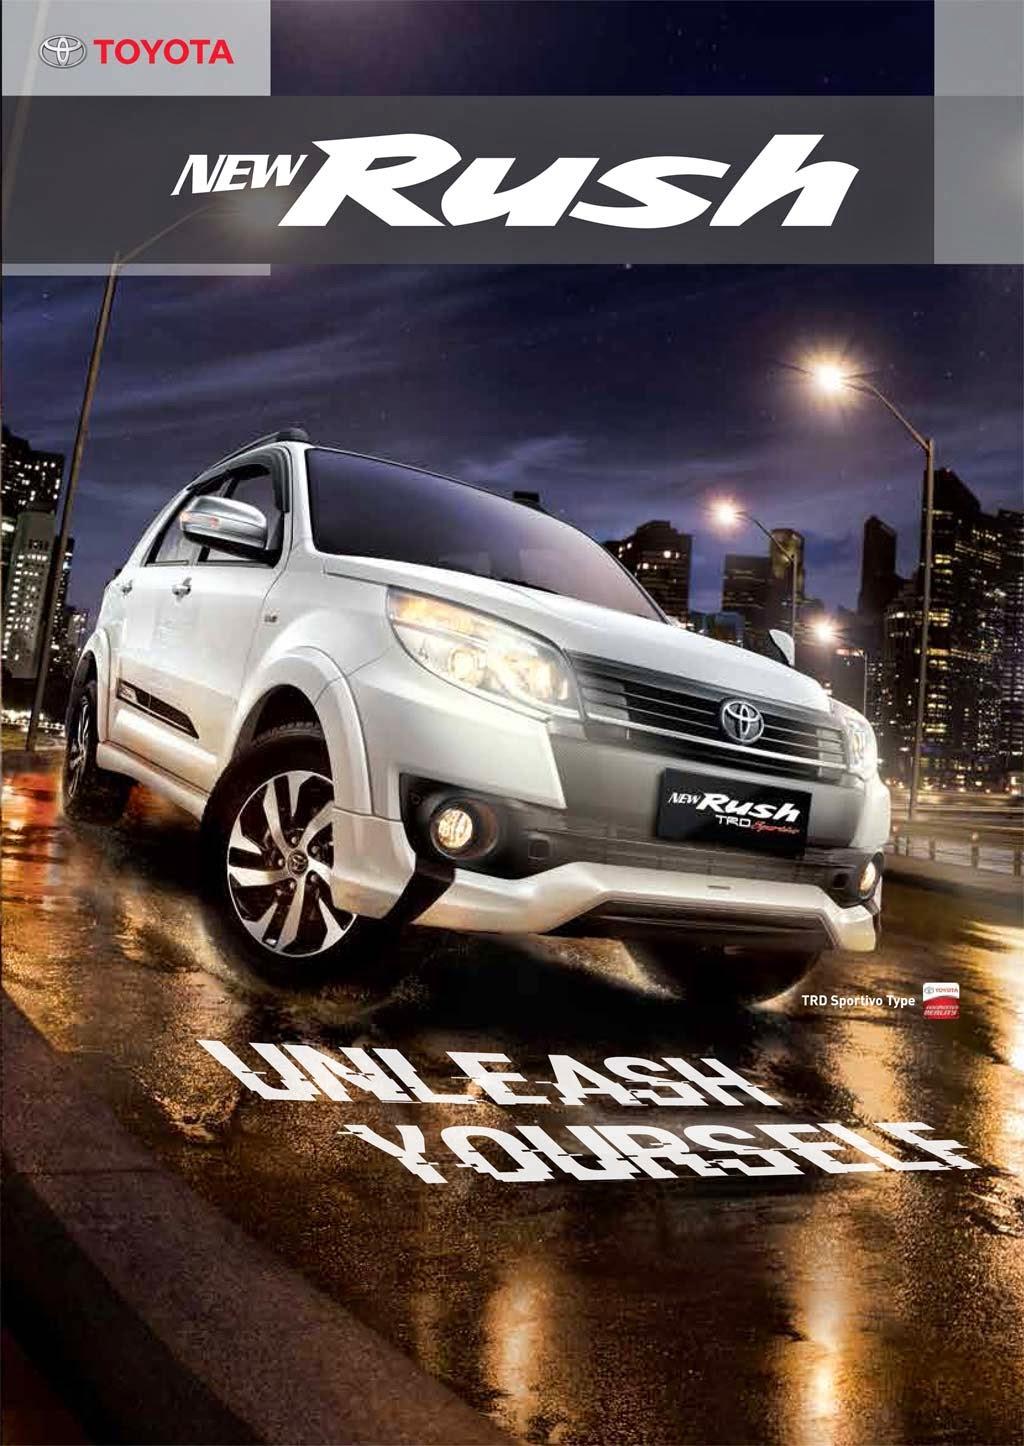 Brosur Grand New Avanza 2018 Toyota Yaris Trd Putih Rush Promo Jakarta